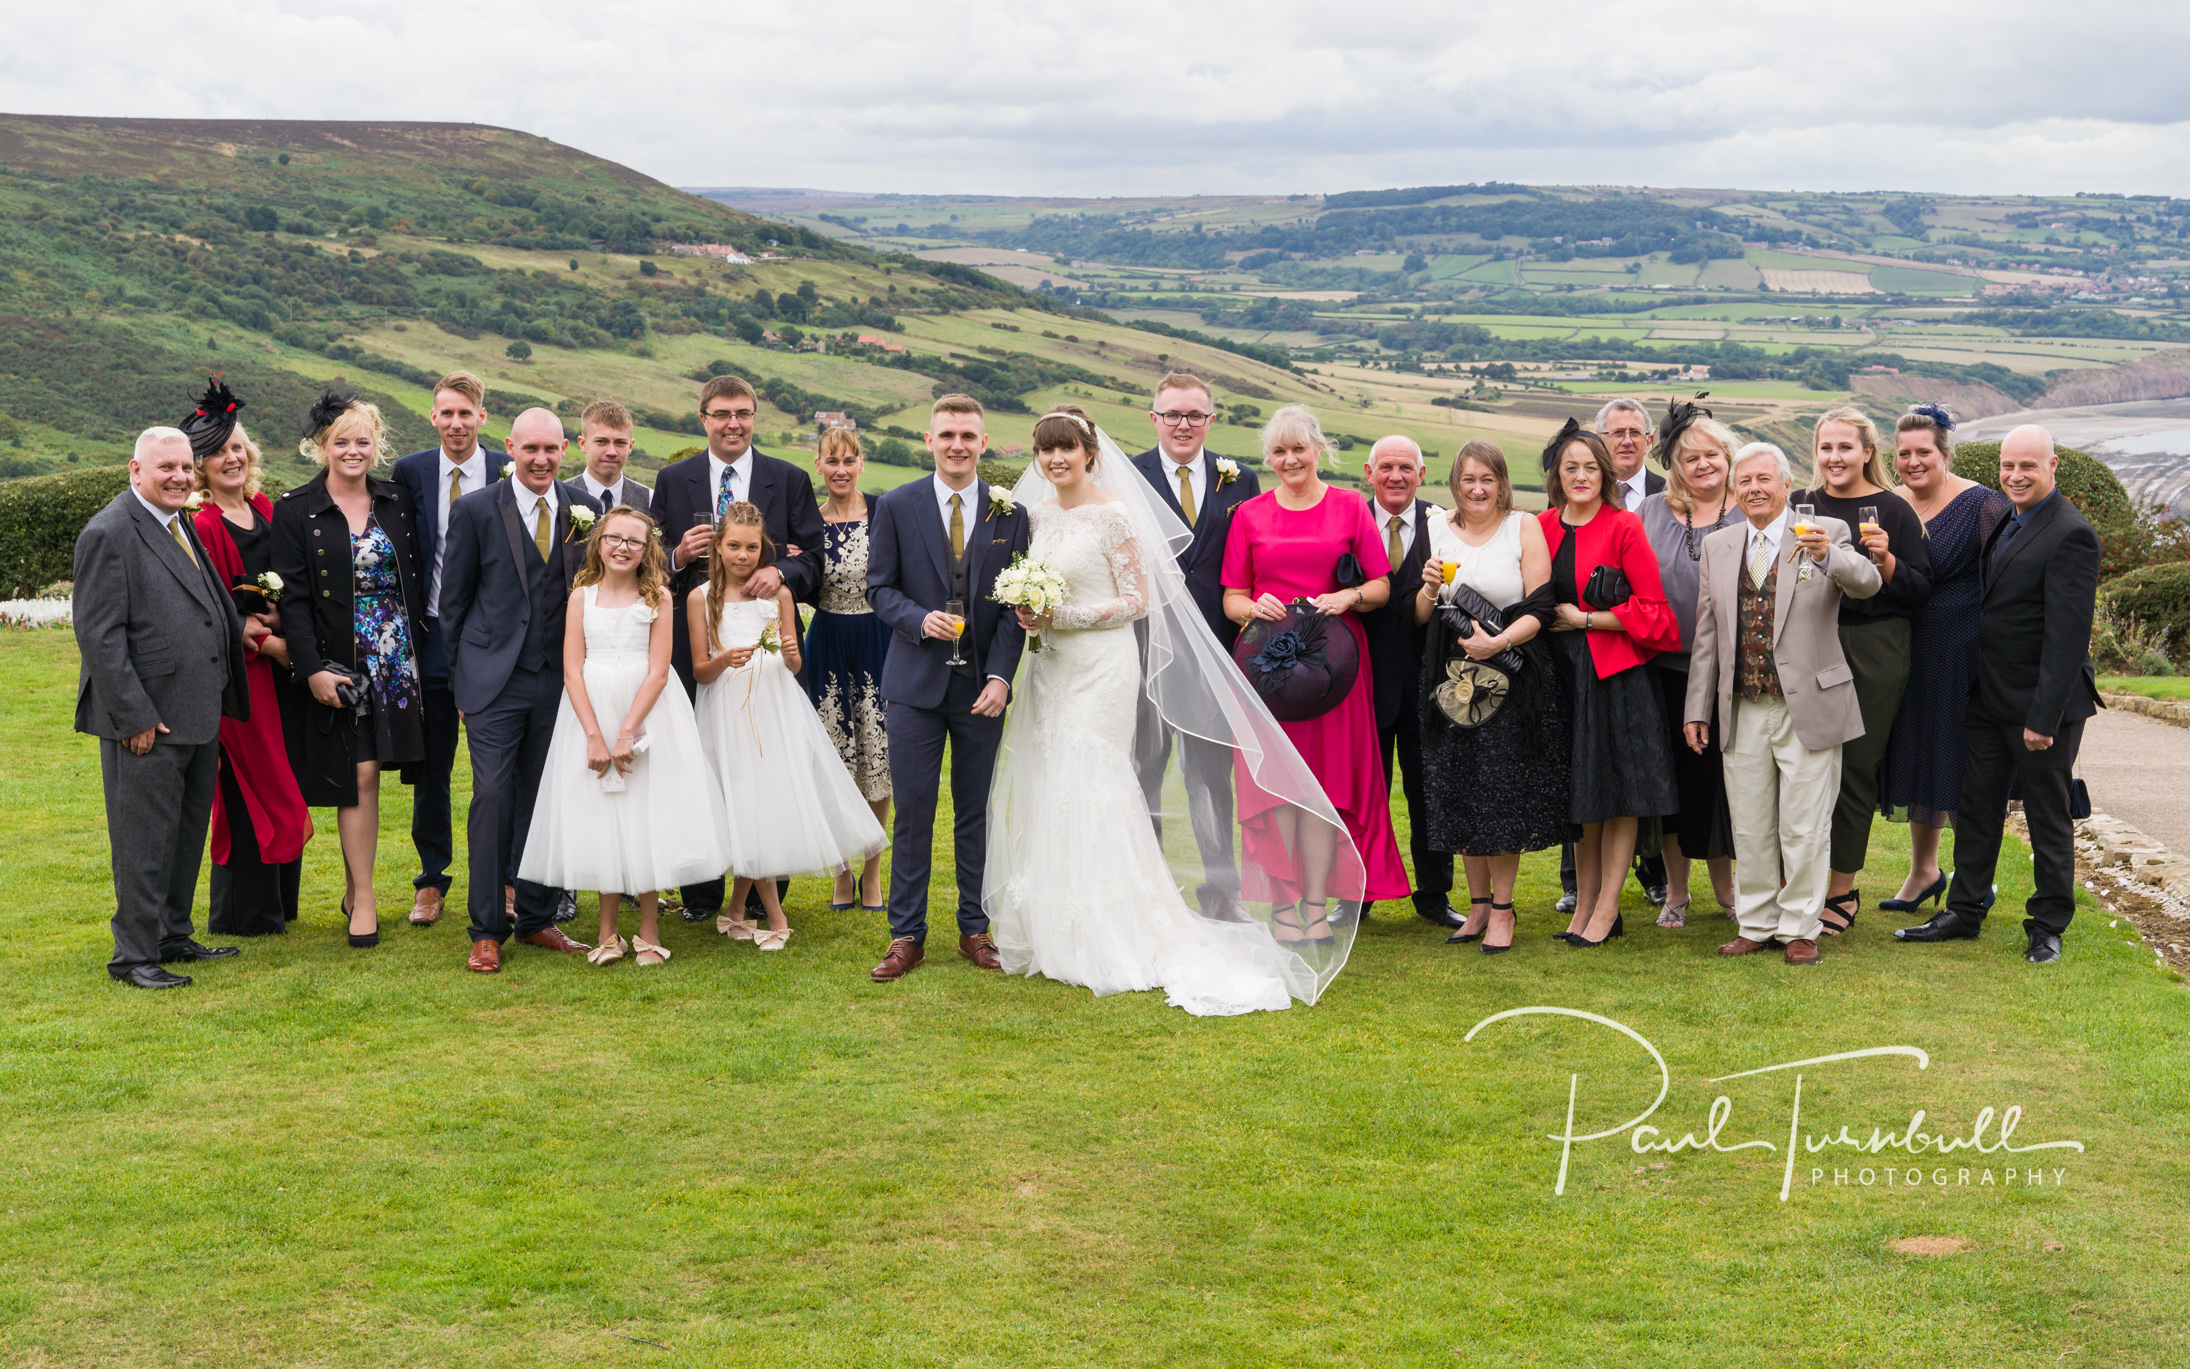 Wedding Party at Raven Hall, Ravenscar